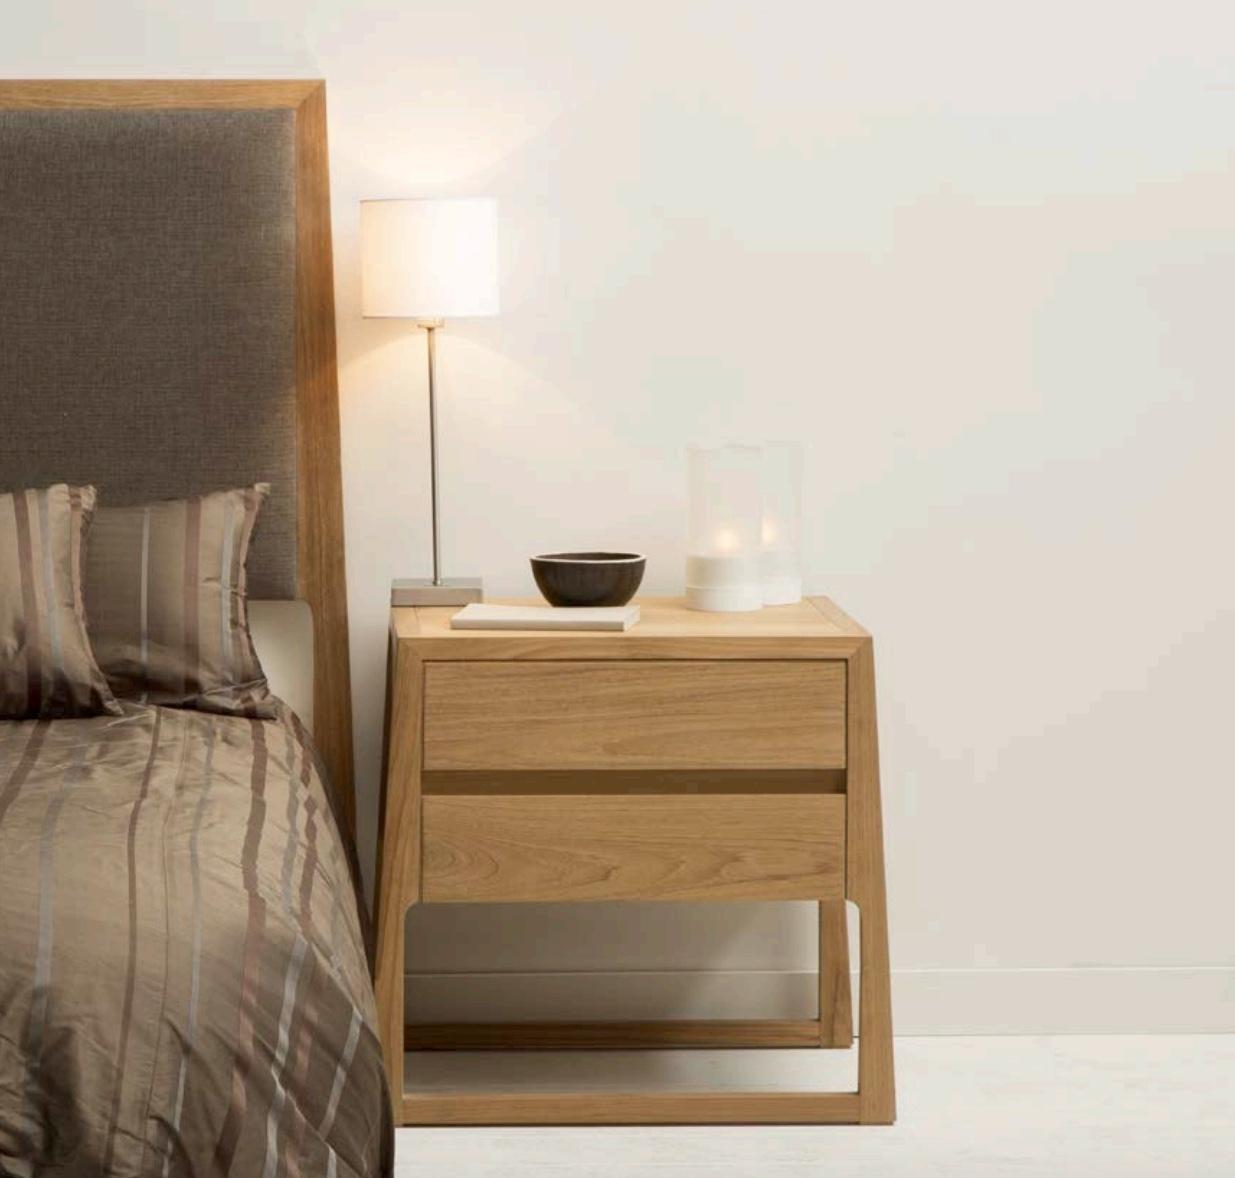 Mesa de noche de tecla color claro  - Mesa de noche de madera de teca  con un tono claro.